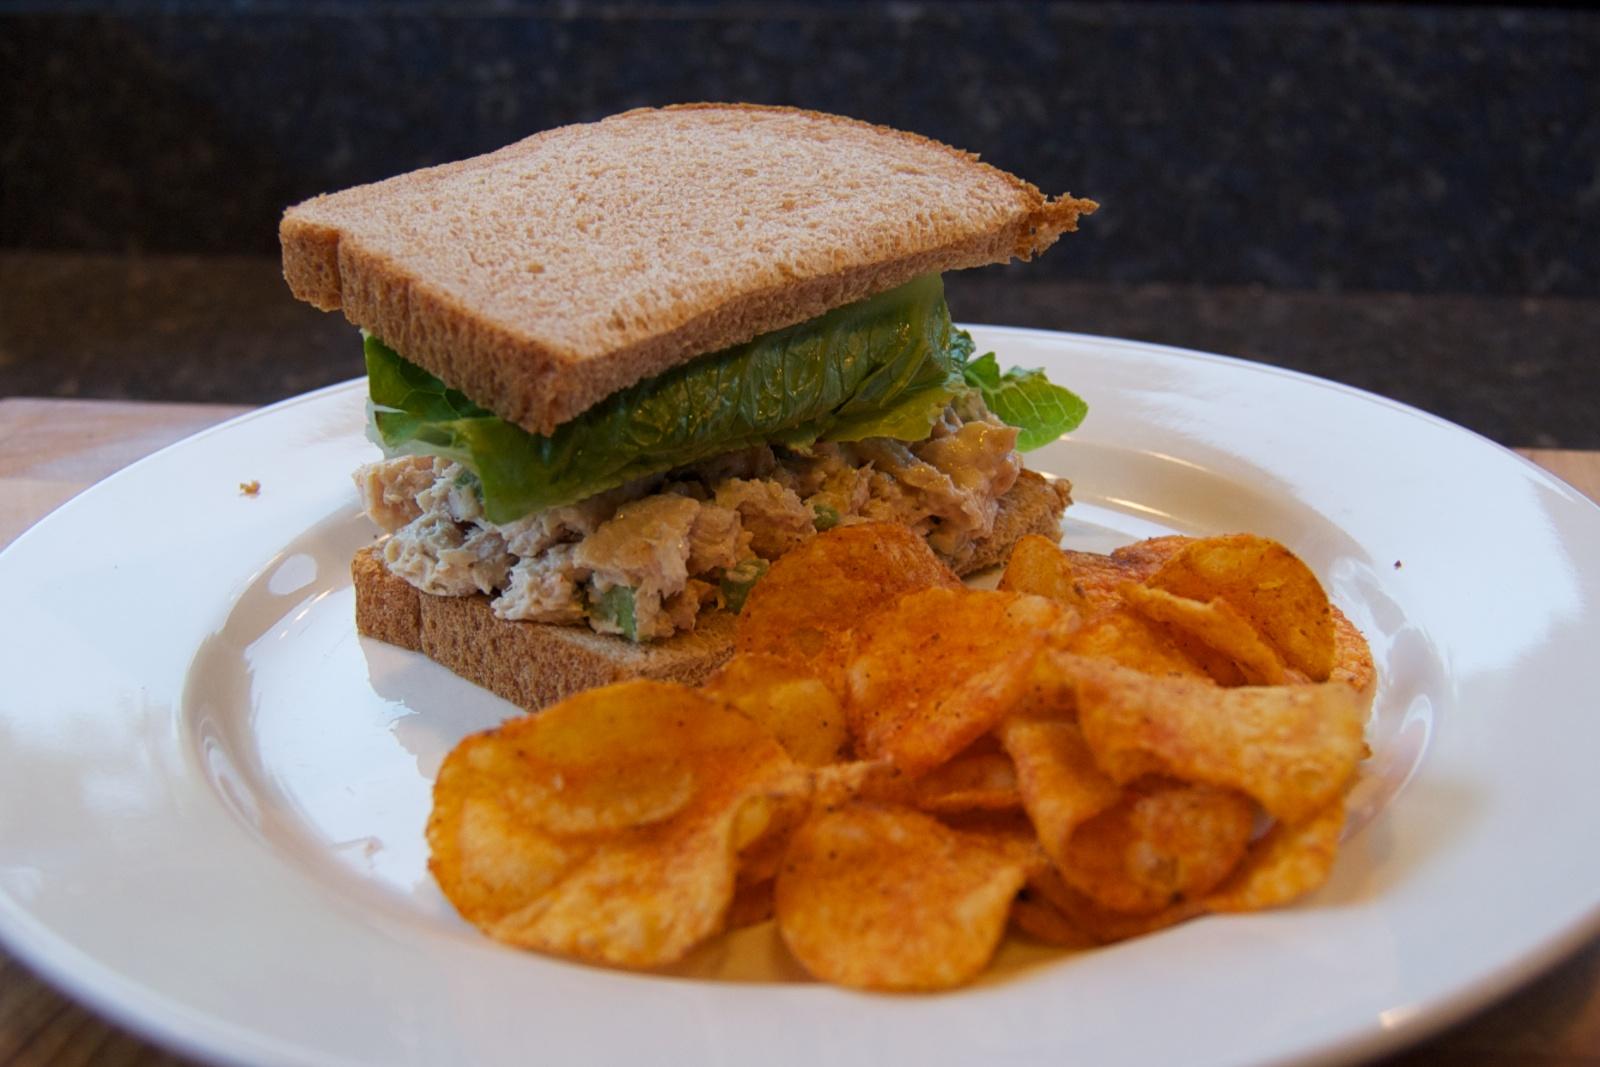 http://blog.rickk.com/food/2011/06/12/ate.2011.06.12.l.jpg